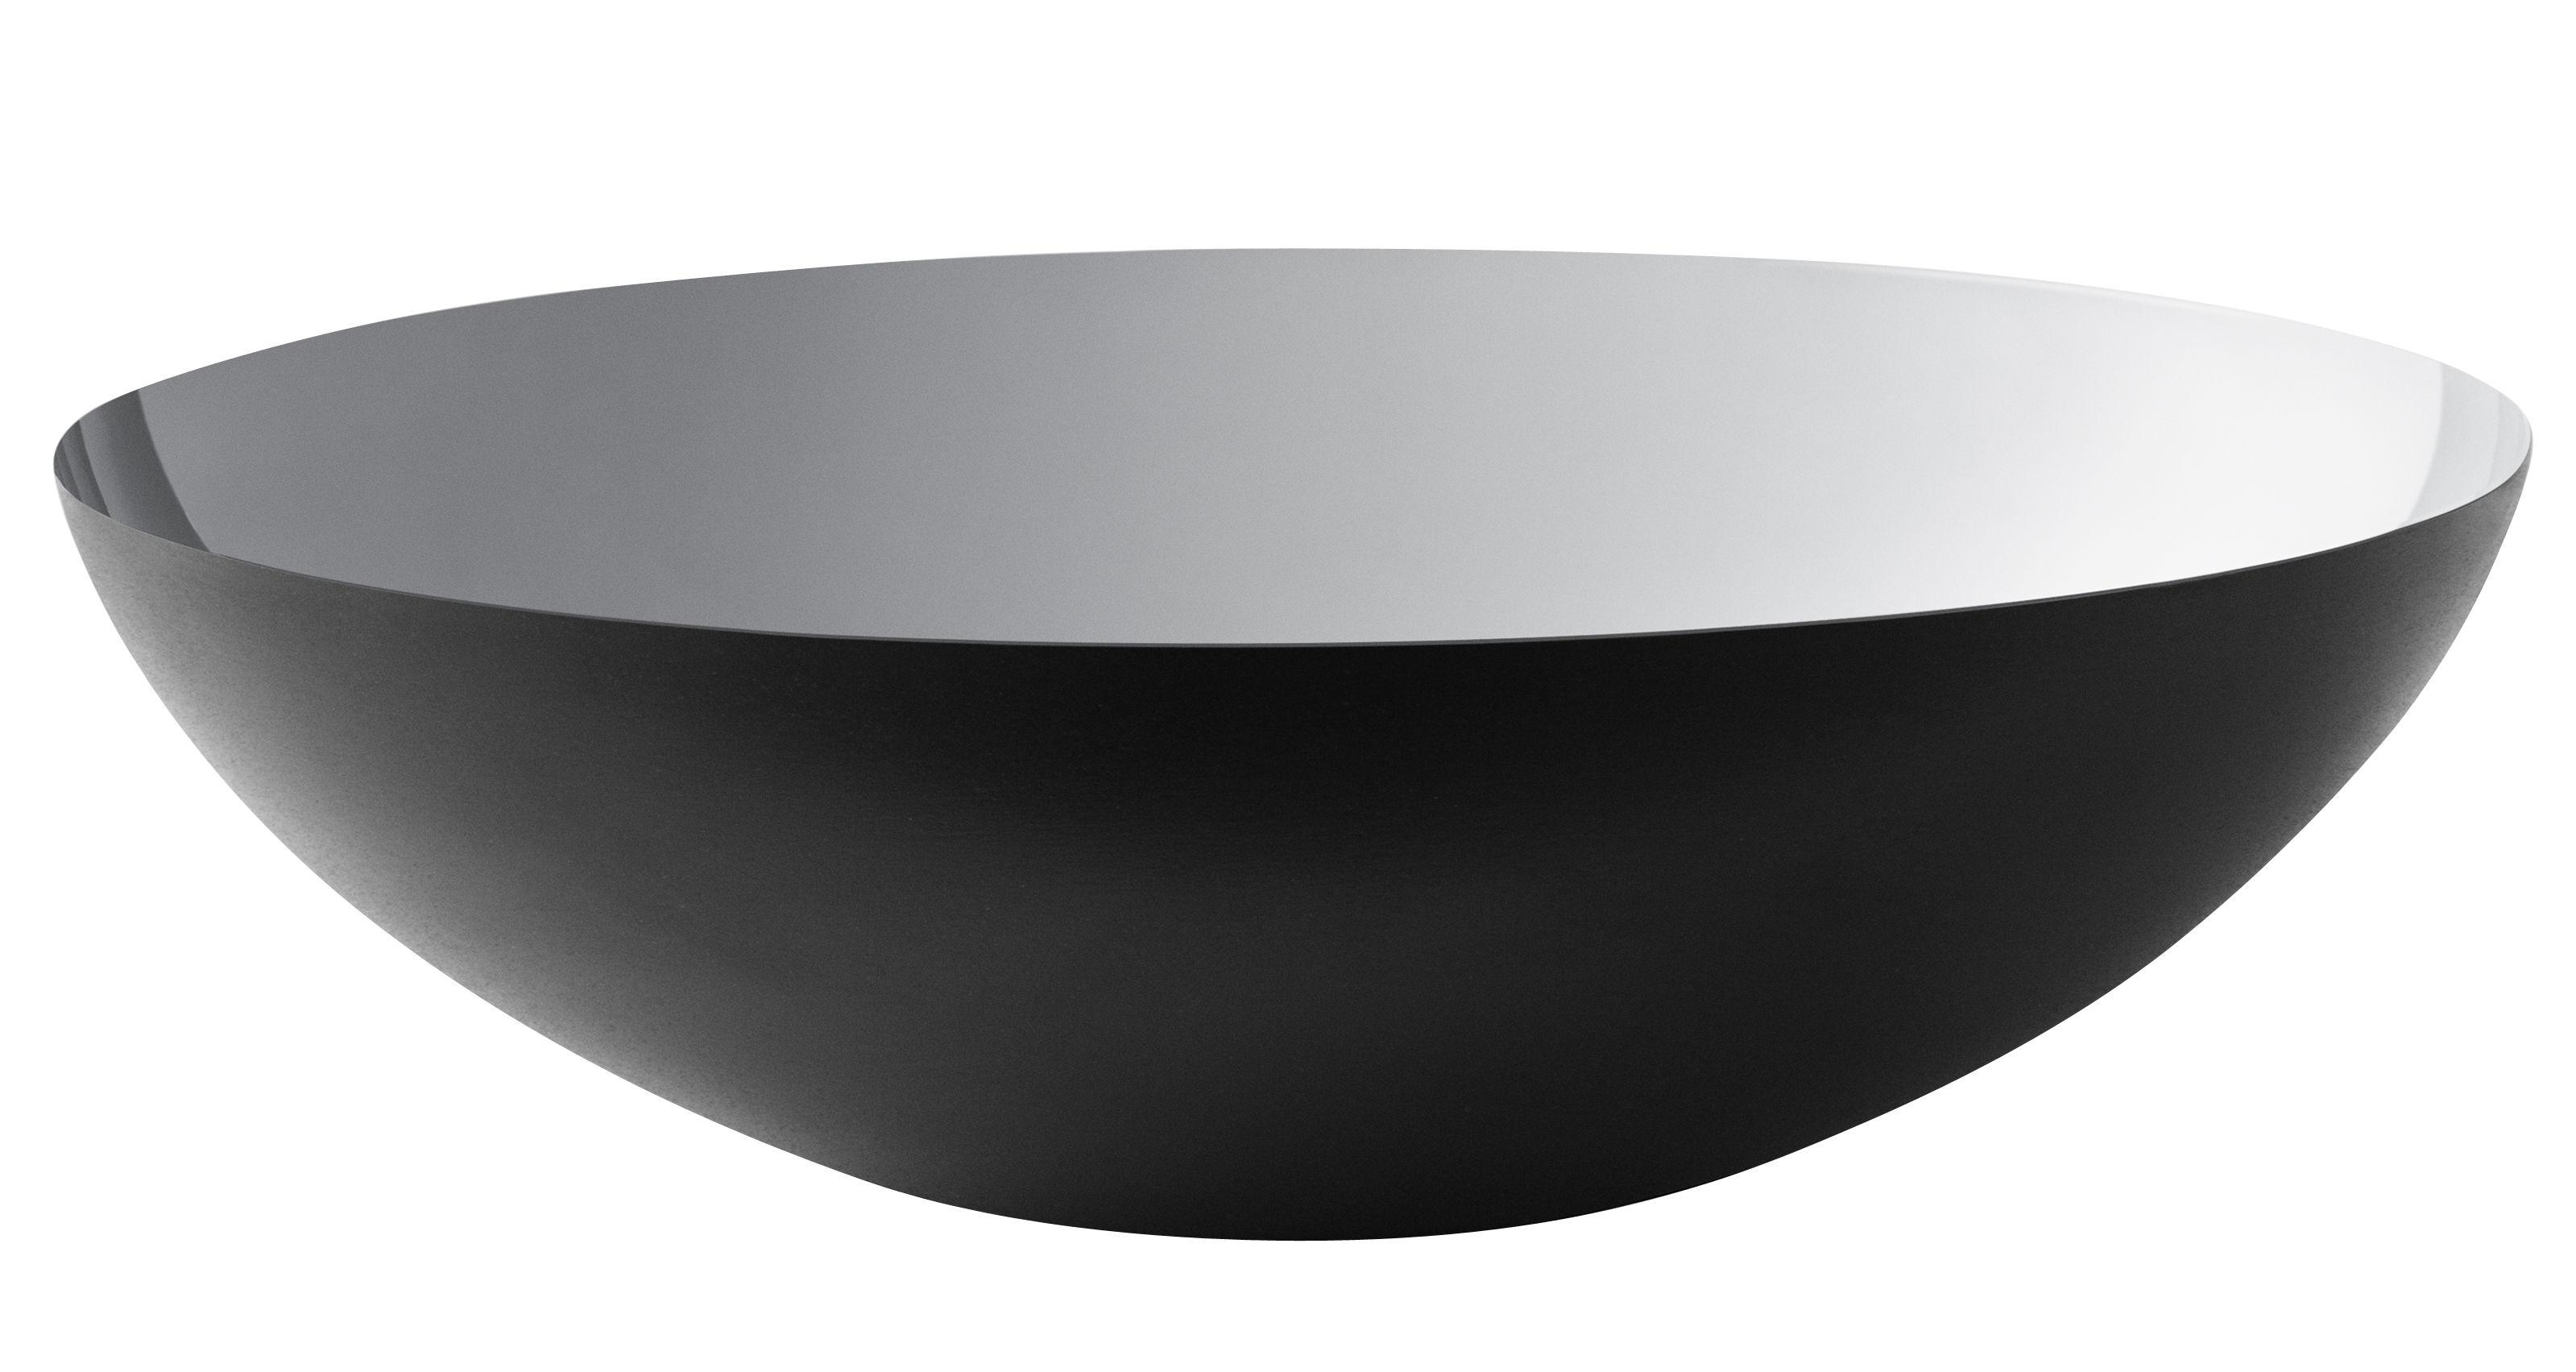 Tableware - Bowls - Krenit Salad bowl - Ø 38 x H 12 cm - Steel by Normann Copenhagen - Black / Silver - Enamelled steel